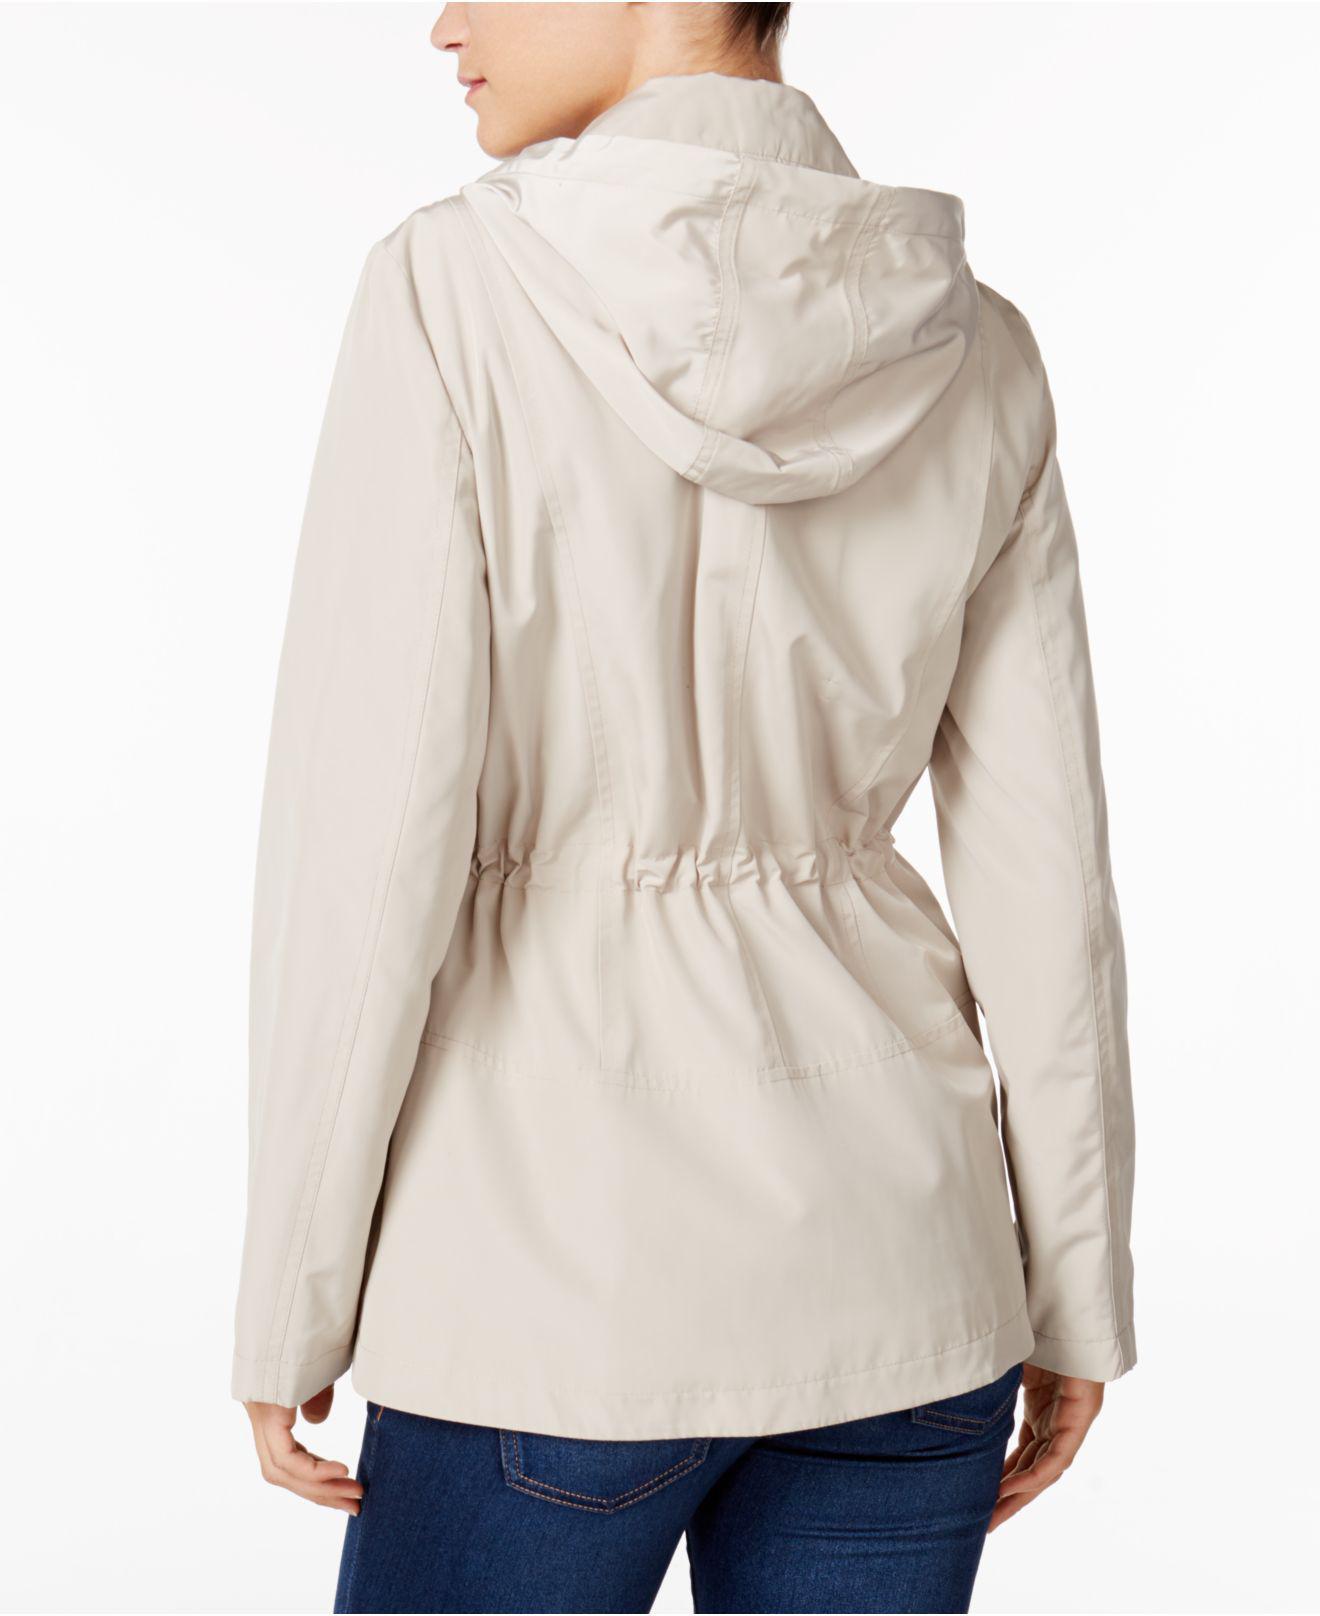 5899518a1 Charter Club Petite Anorak Rain Jacket - Save 34% - Lyst